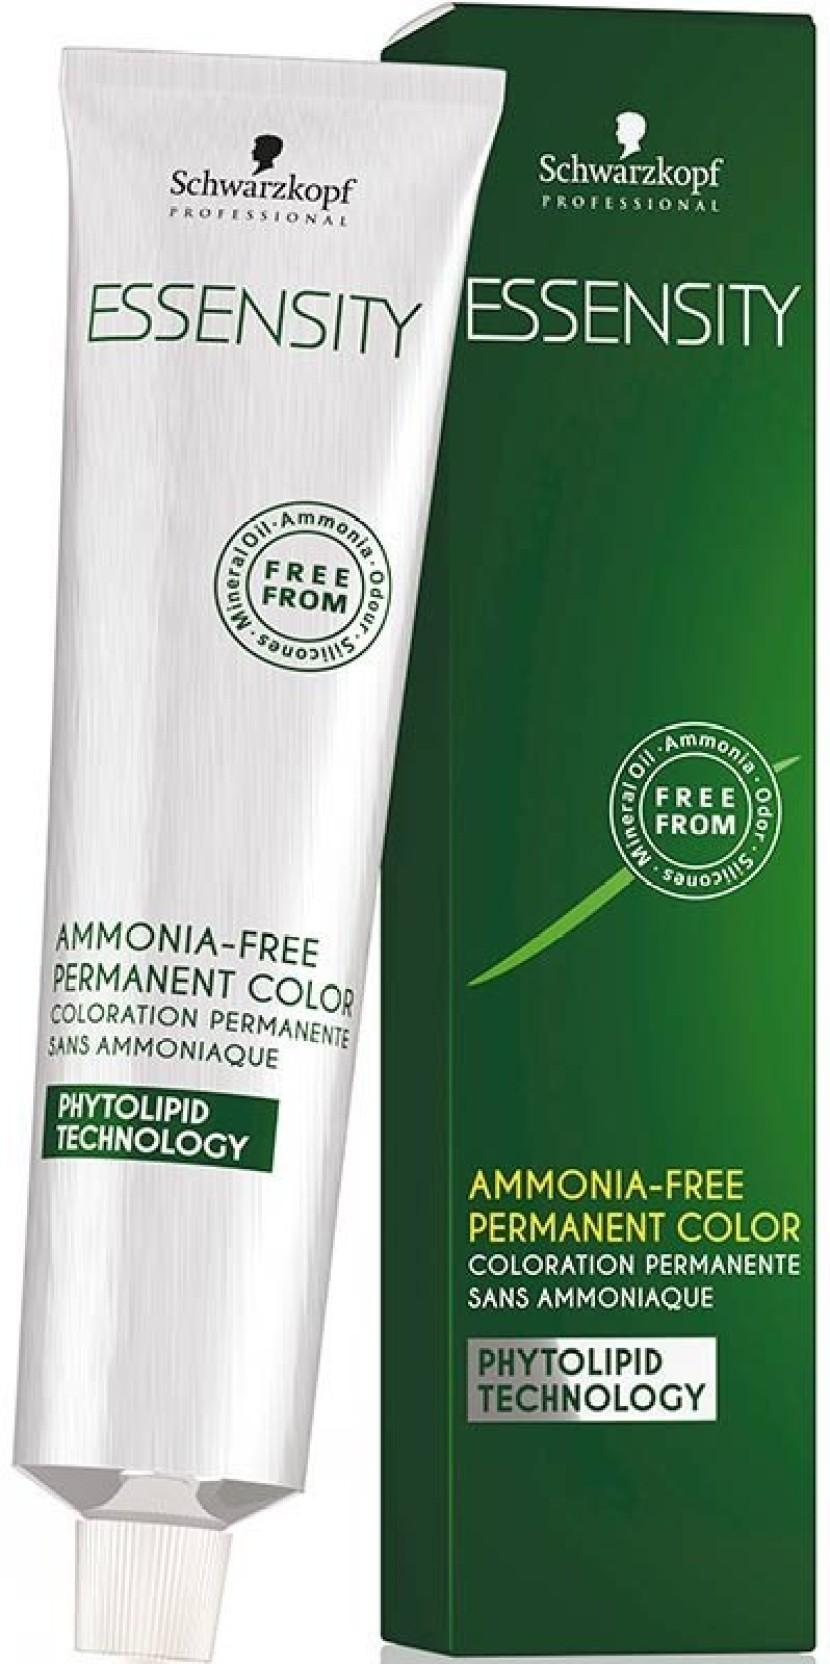 Schwarzkopf Essensity Ammonia Free Permanent Hair Color Price In